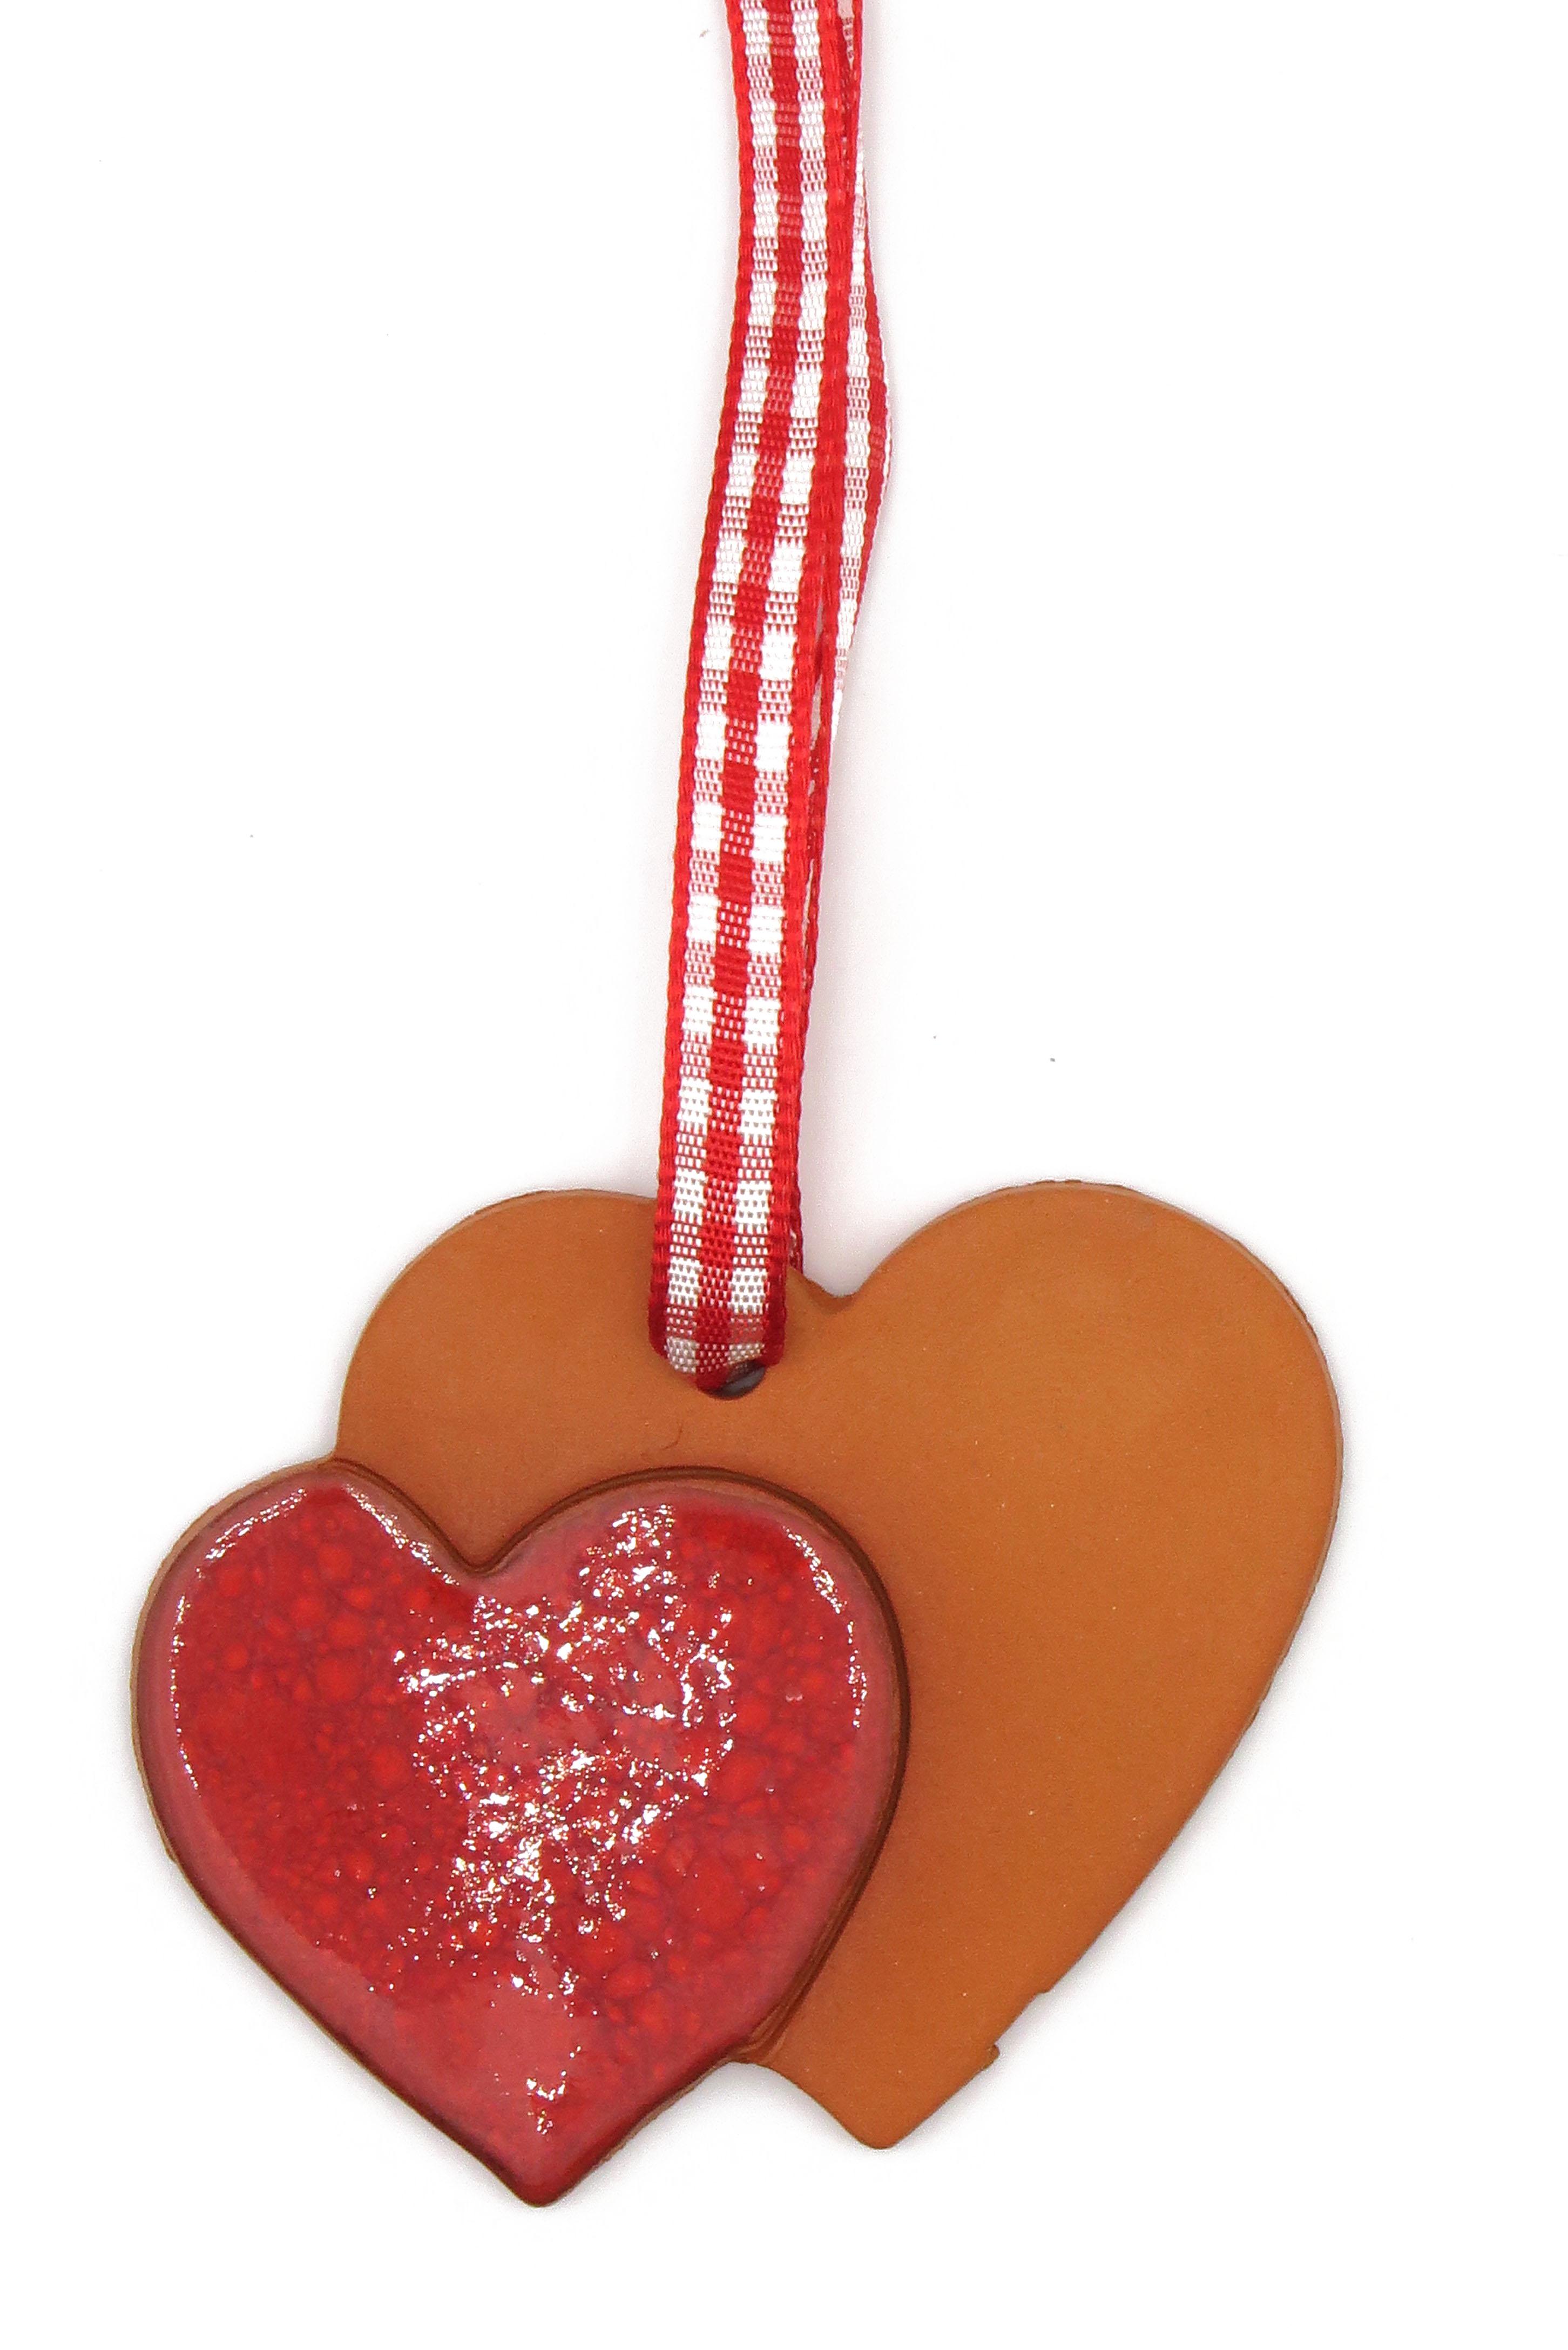 Doppel Herz Geschenk Anhänger Keramik Rot/ M 5cm